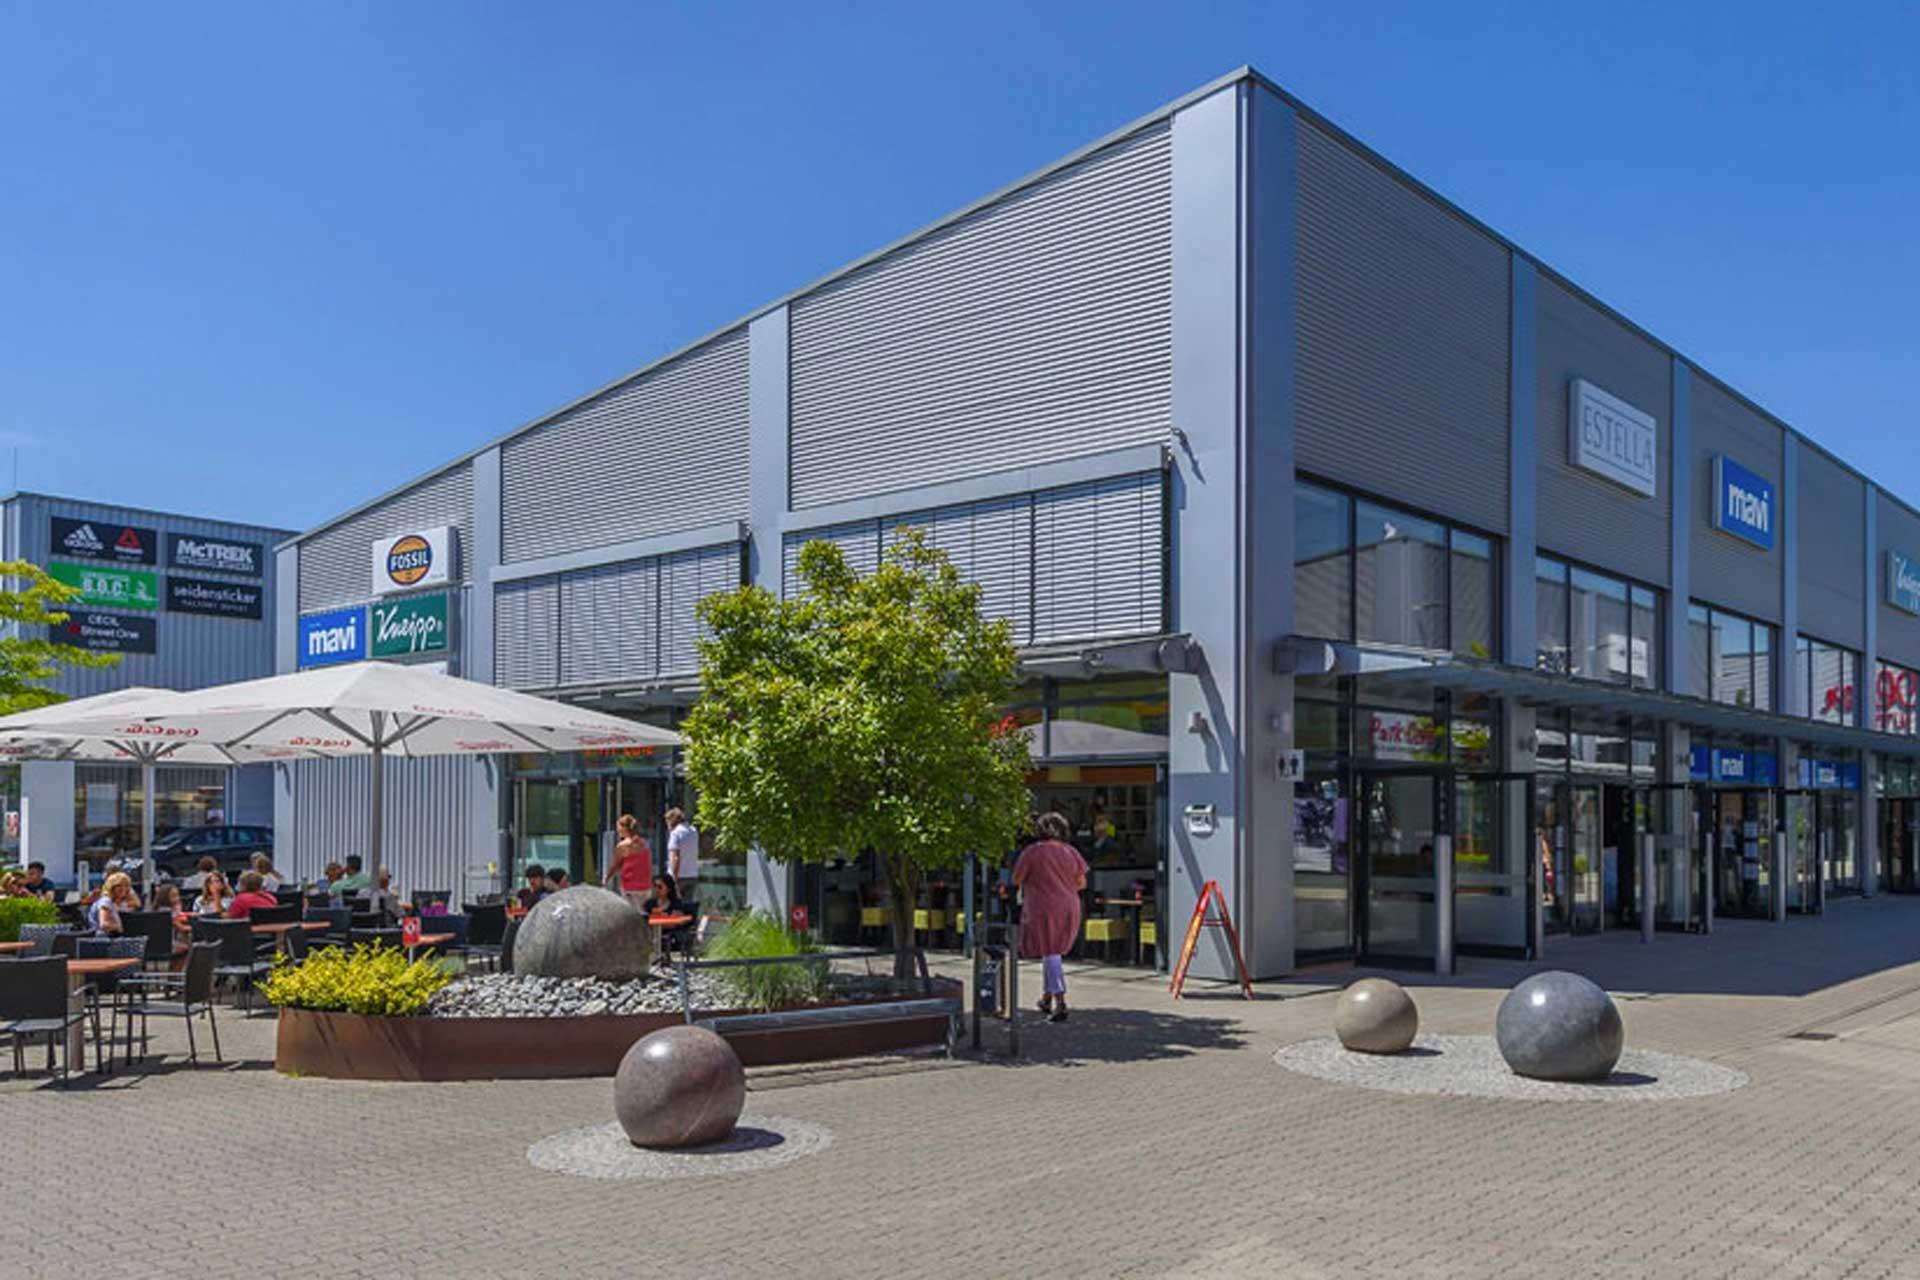 Outlet Center Ochtumpark Bremen